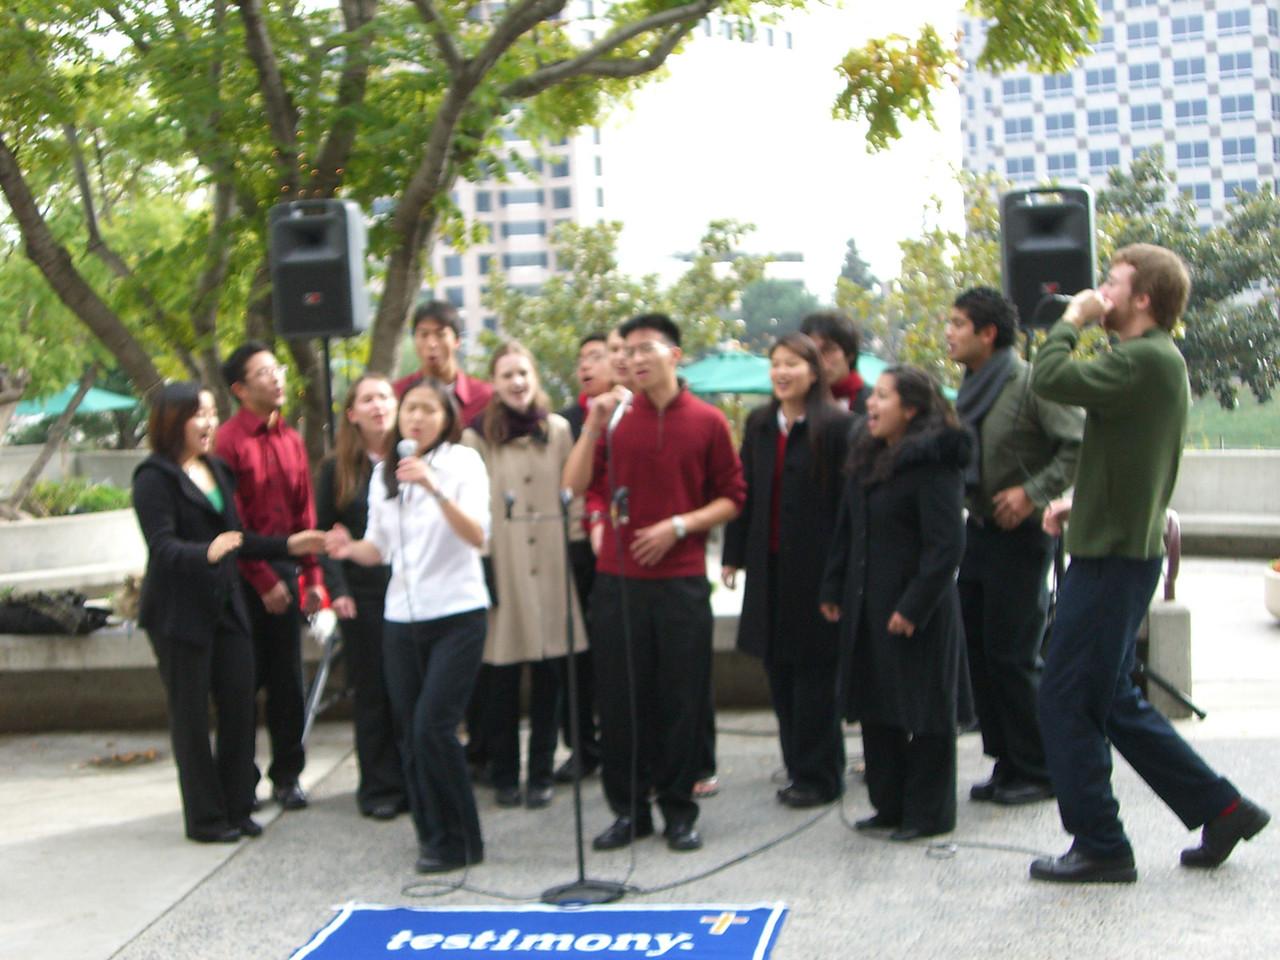 2005 12 18 Sun - Lake Ave Church - Jenny Alyono & Ben Yu on Emmanuel 4